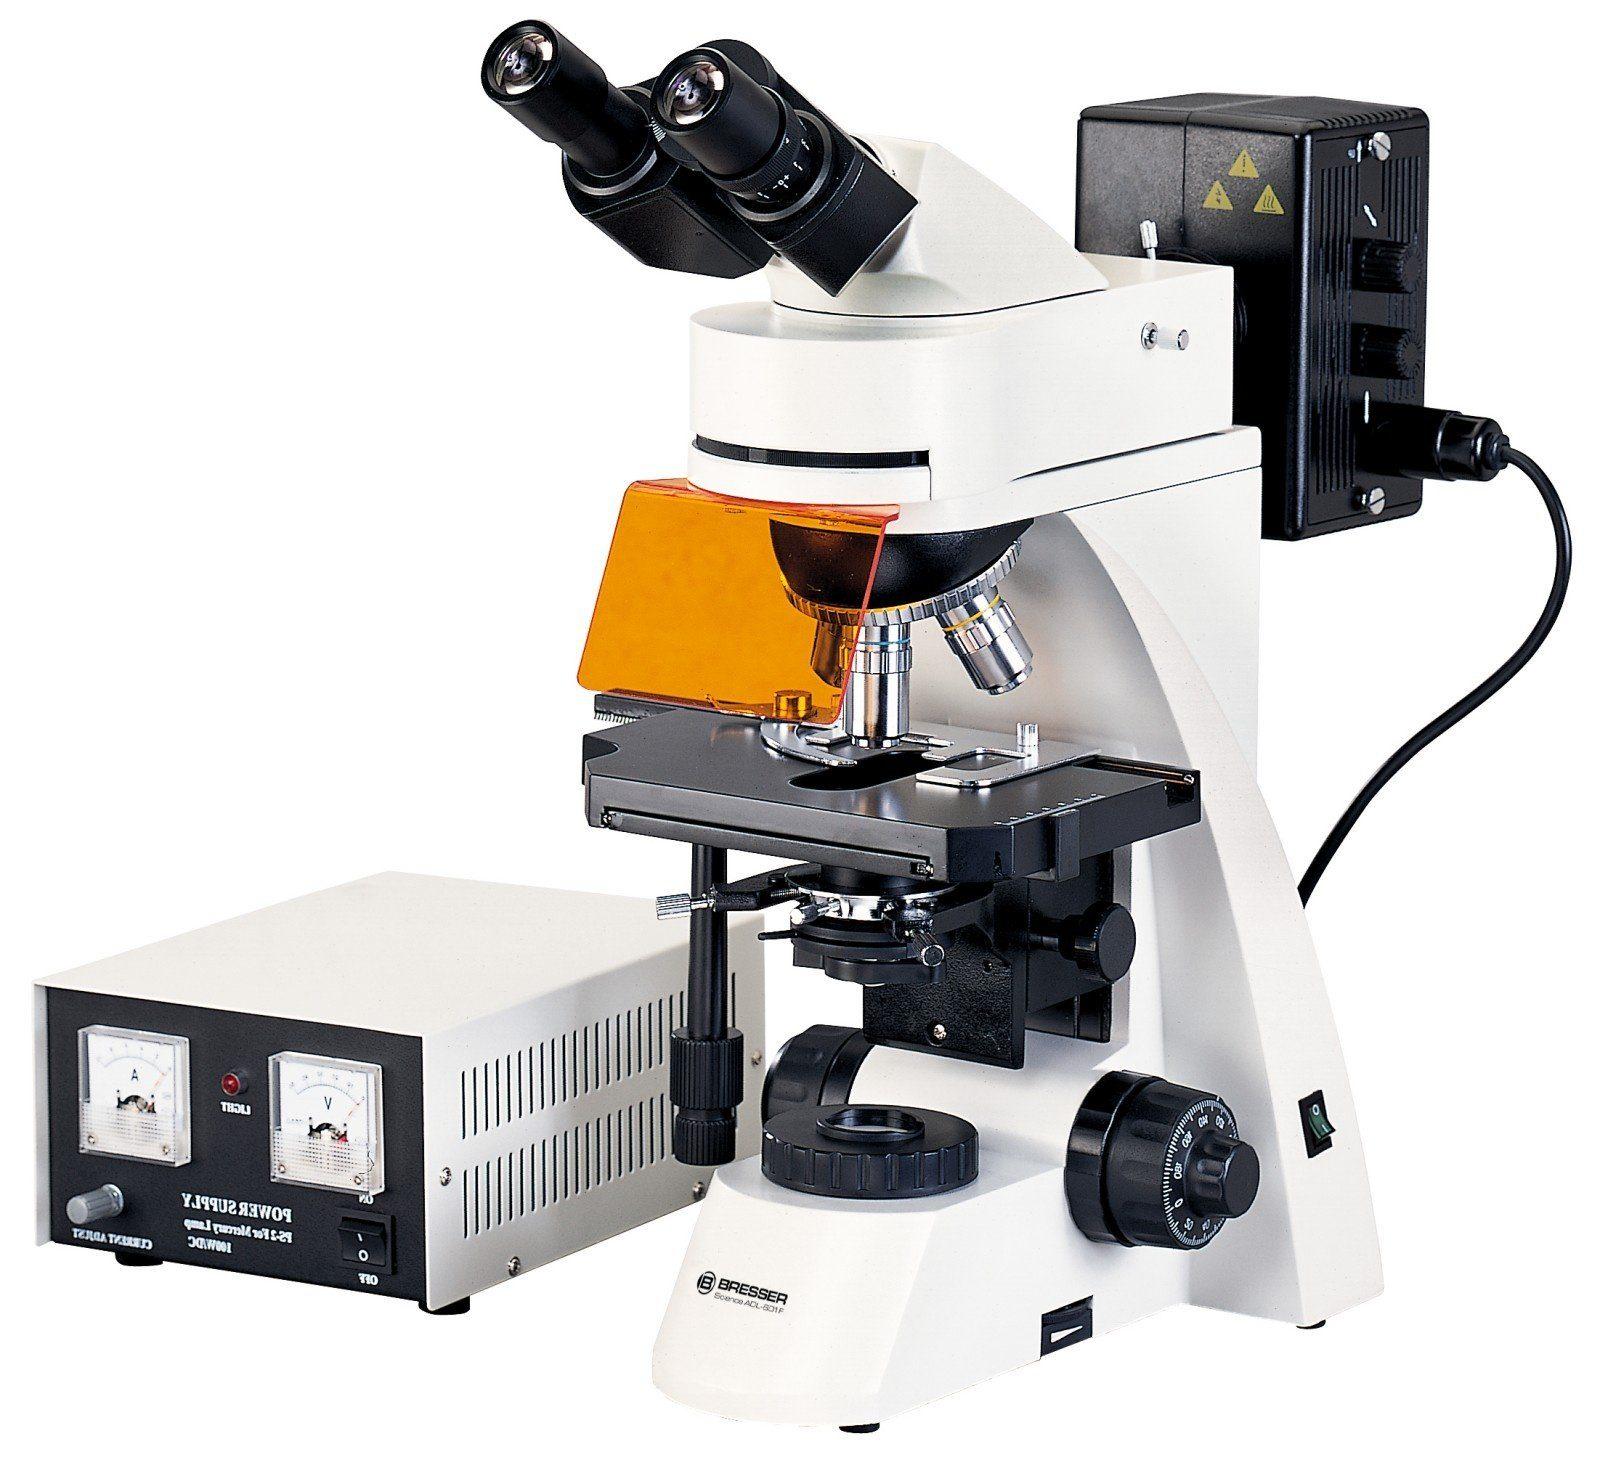 Bresser Mikroskop »Science ADL 601 F LED 40-1000x Mikroskop«